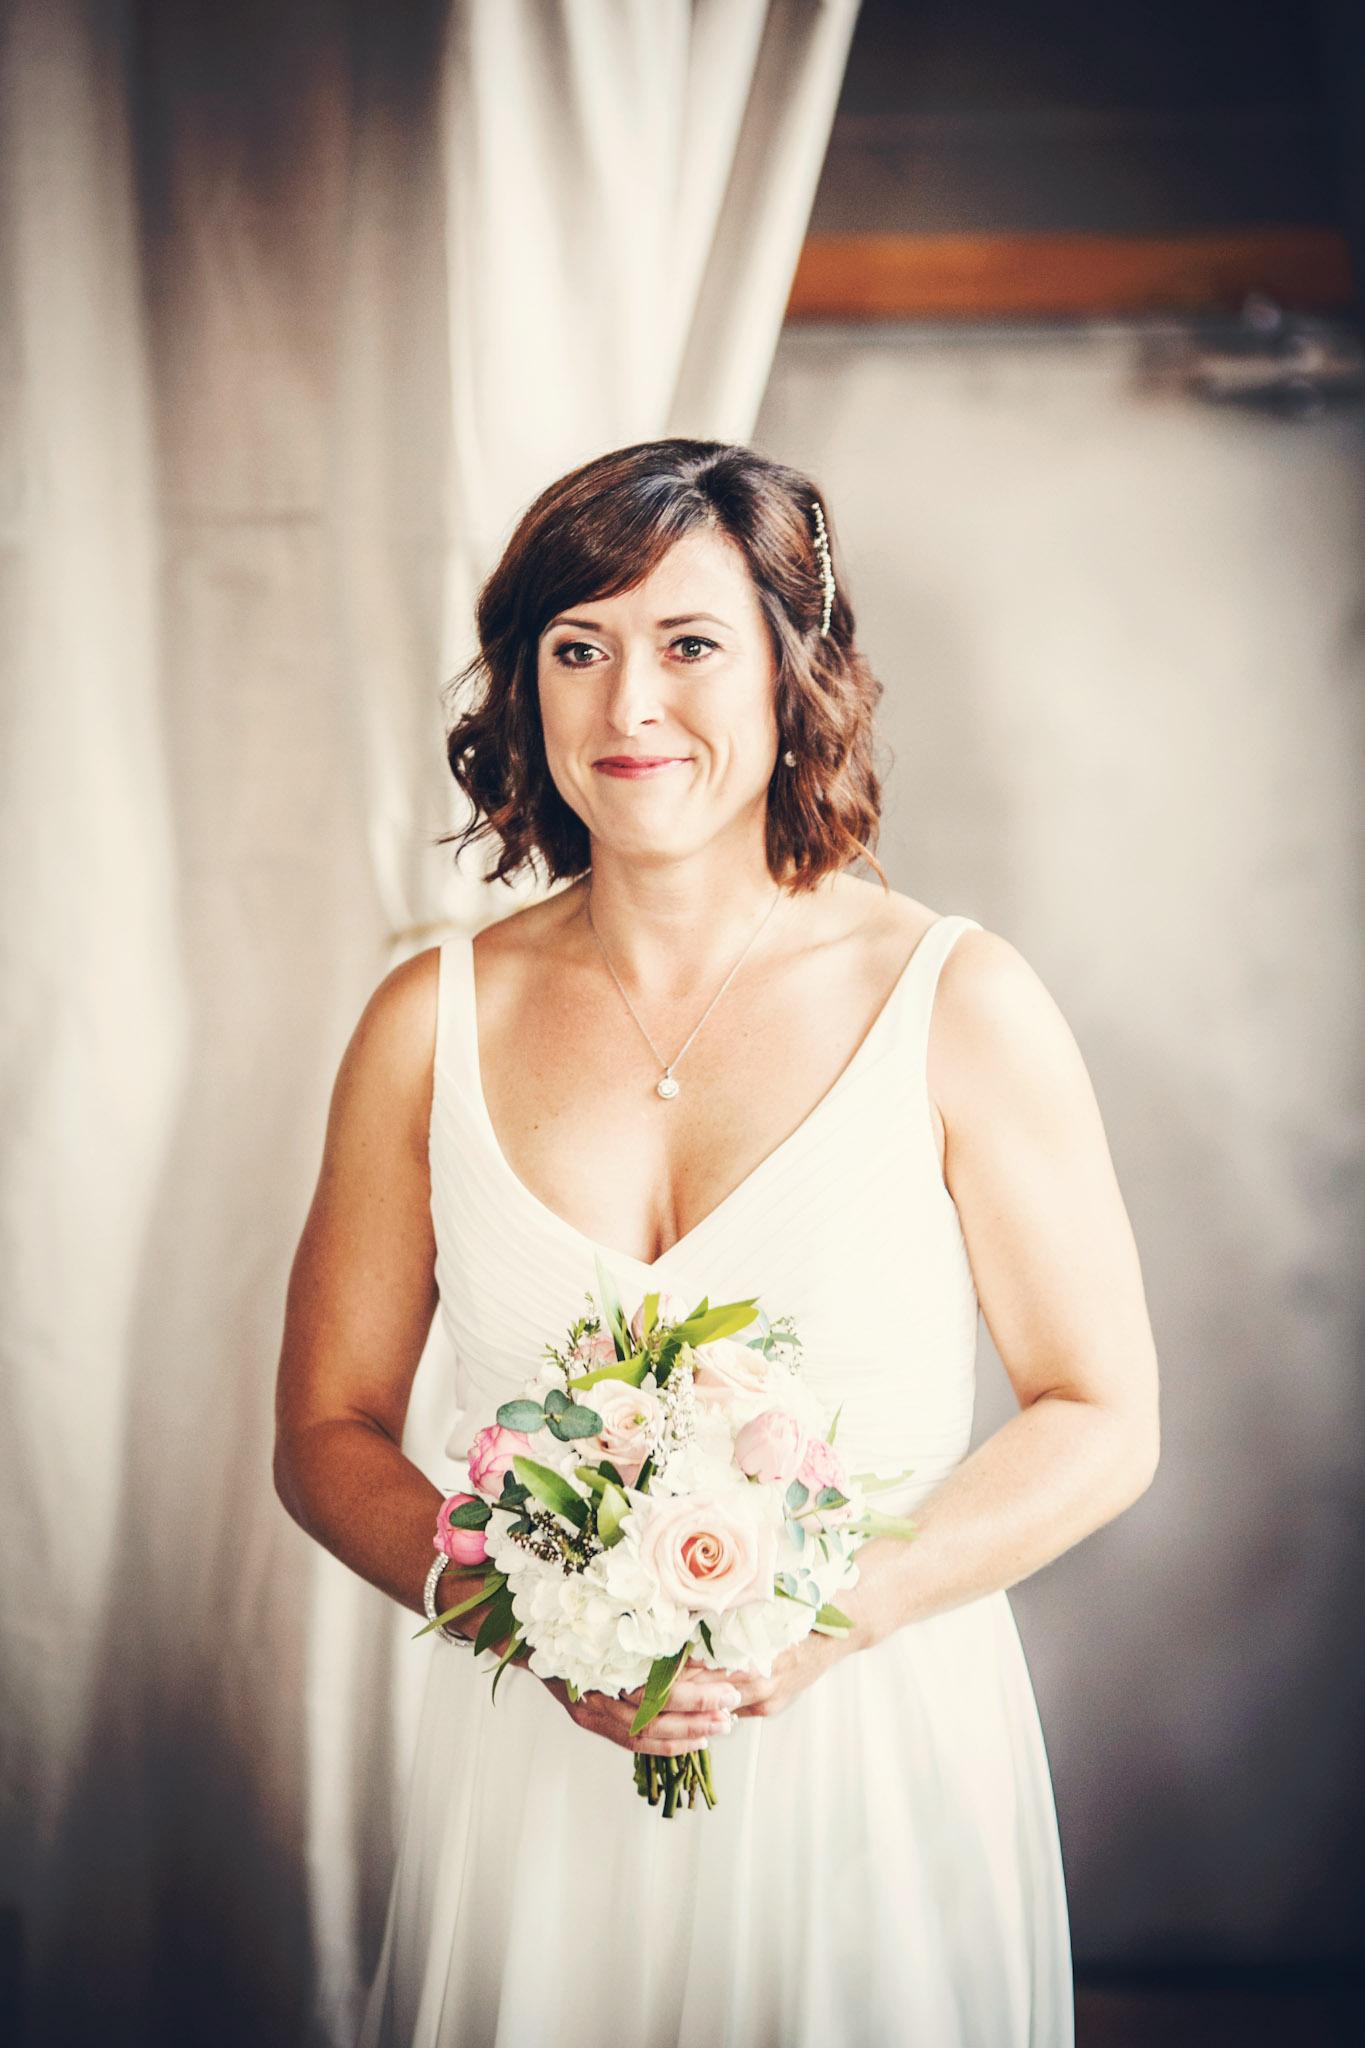 The_Vow_Exchange_Kansas_City_Small_Budget_Wedding_Venue_Lisa & John_039b.jpg